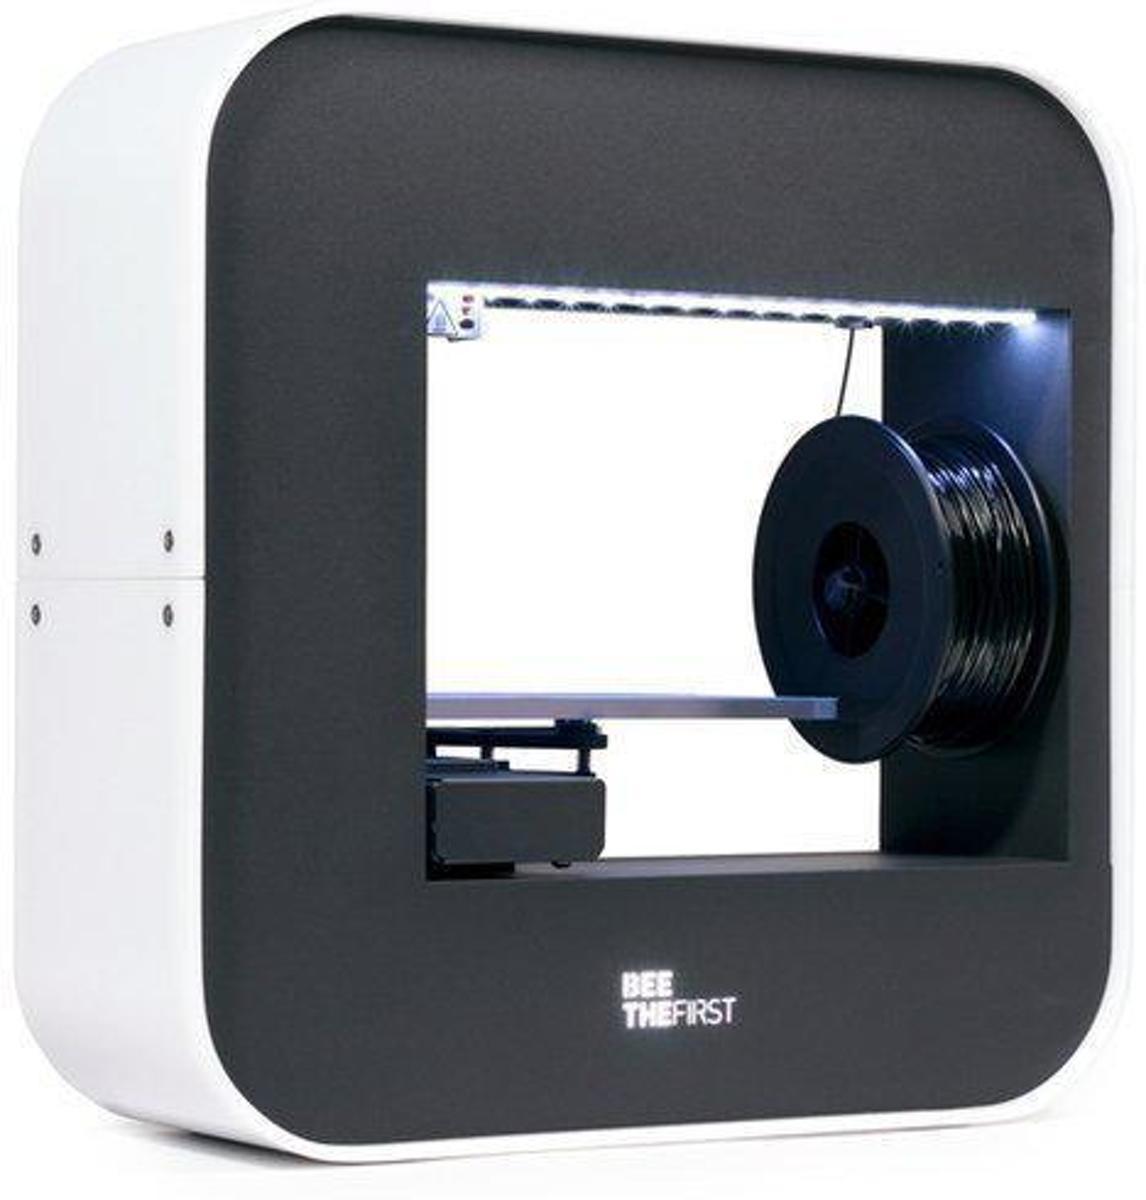 Beethefirst - 3D-printer kopen